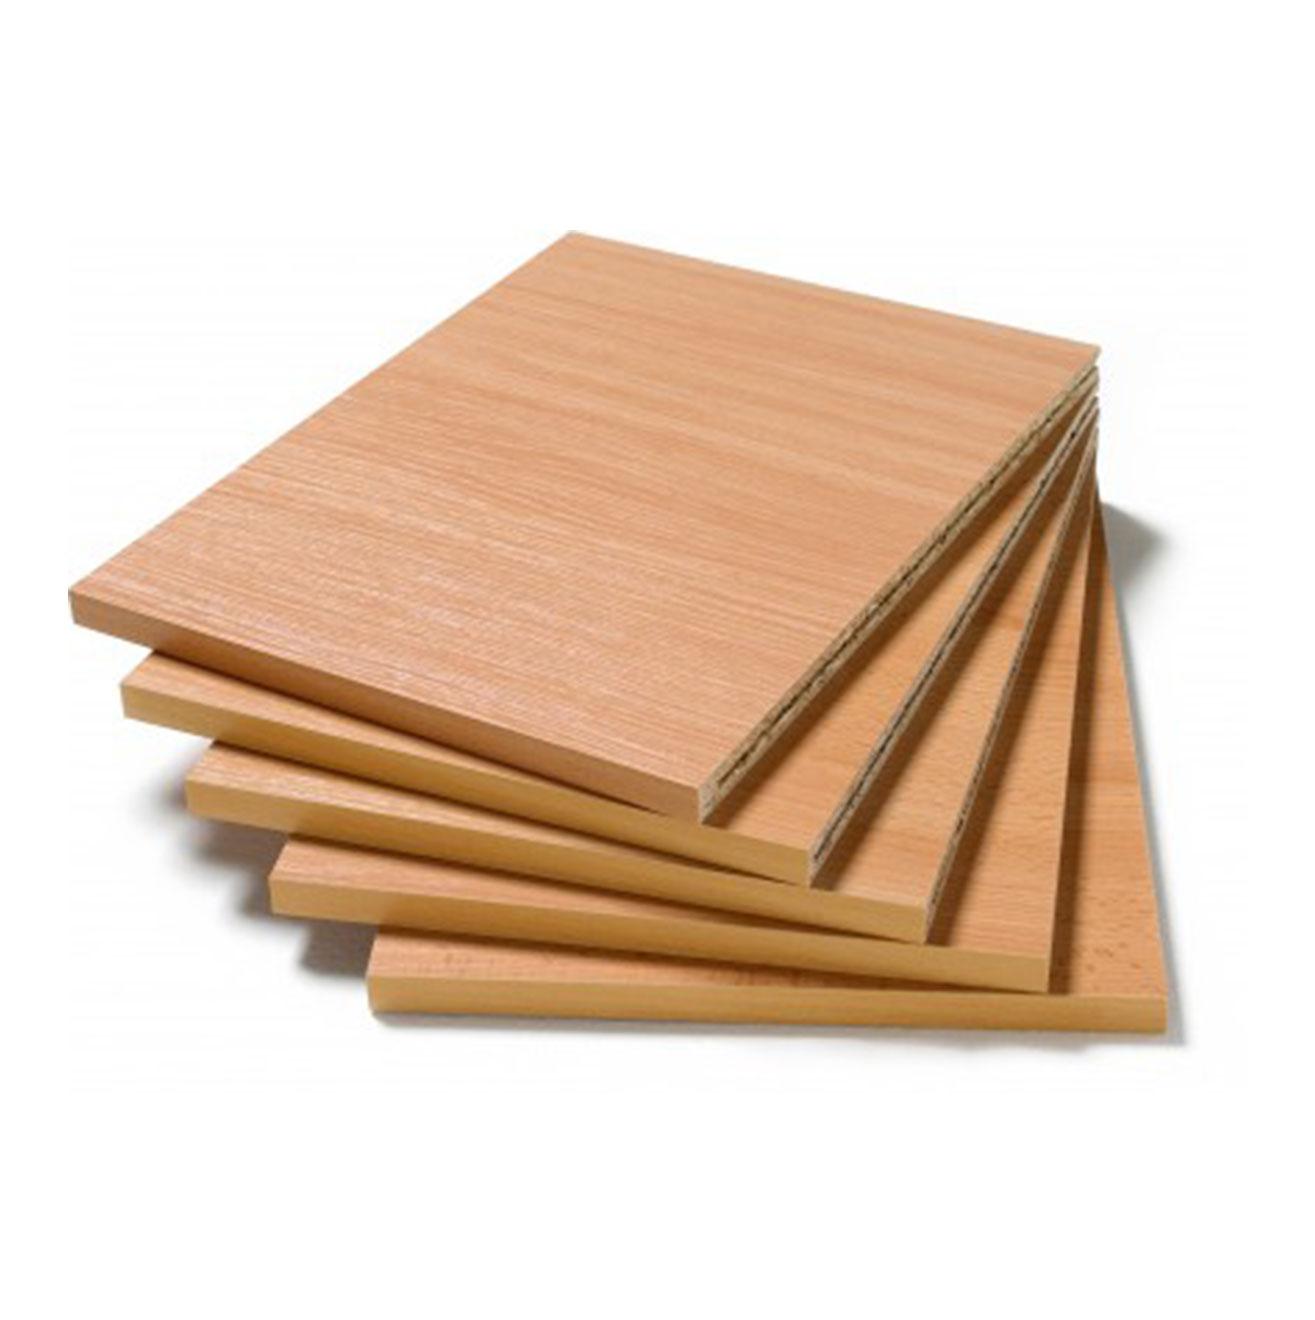 Extra shelving packs - Beech